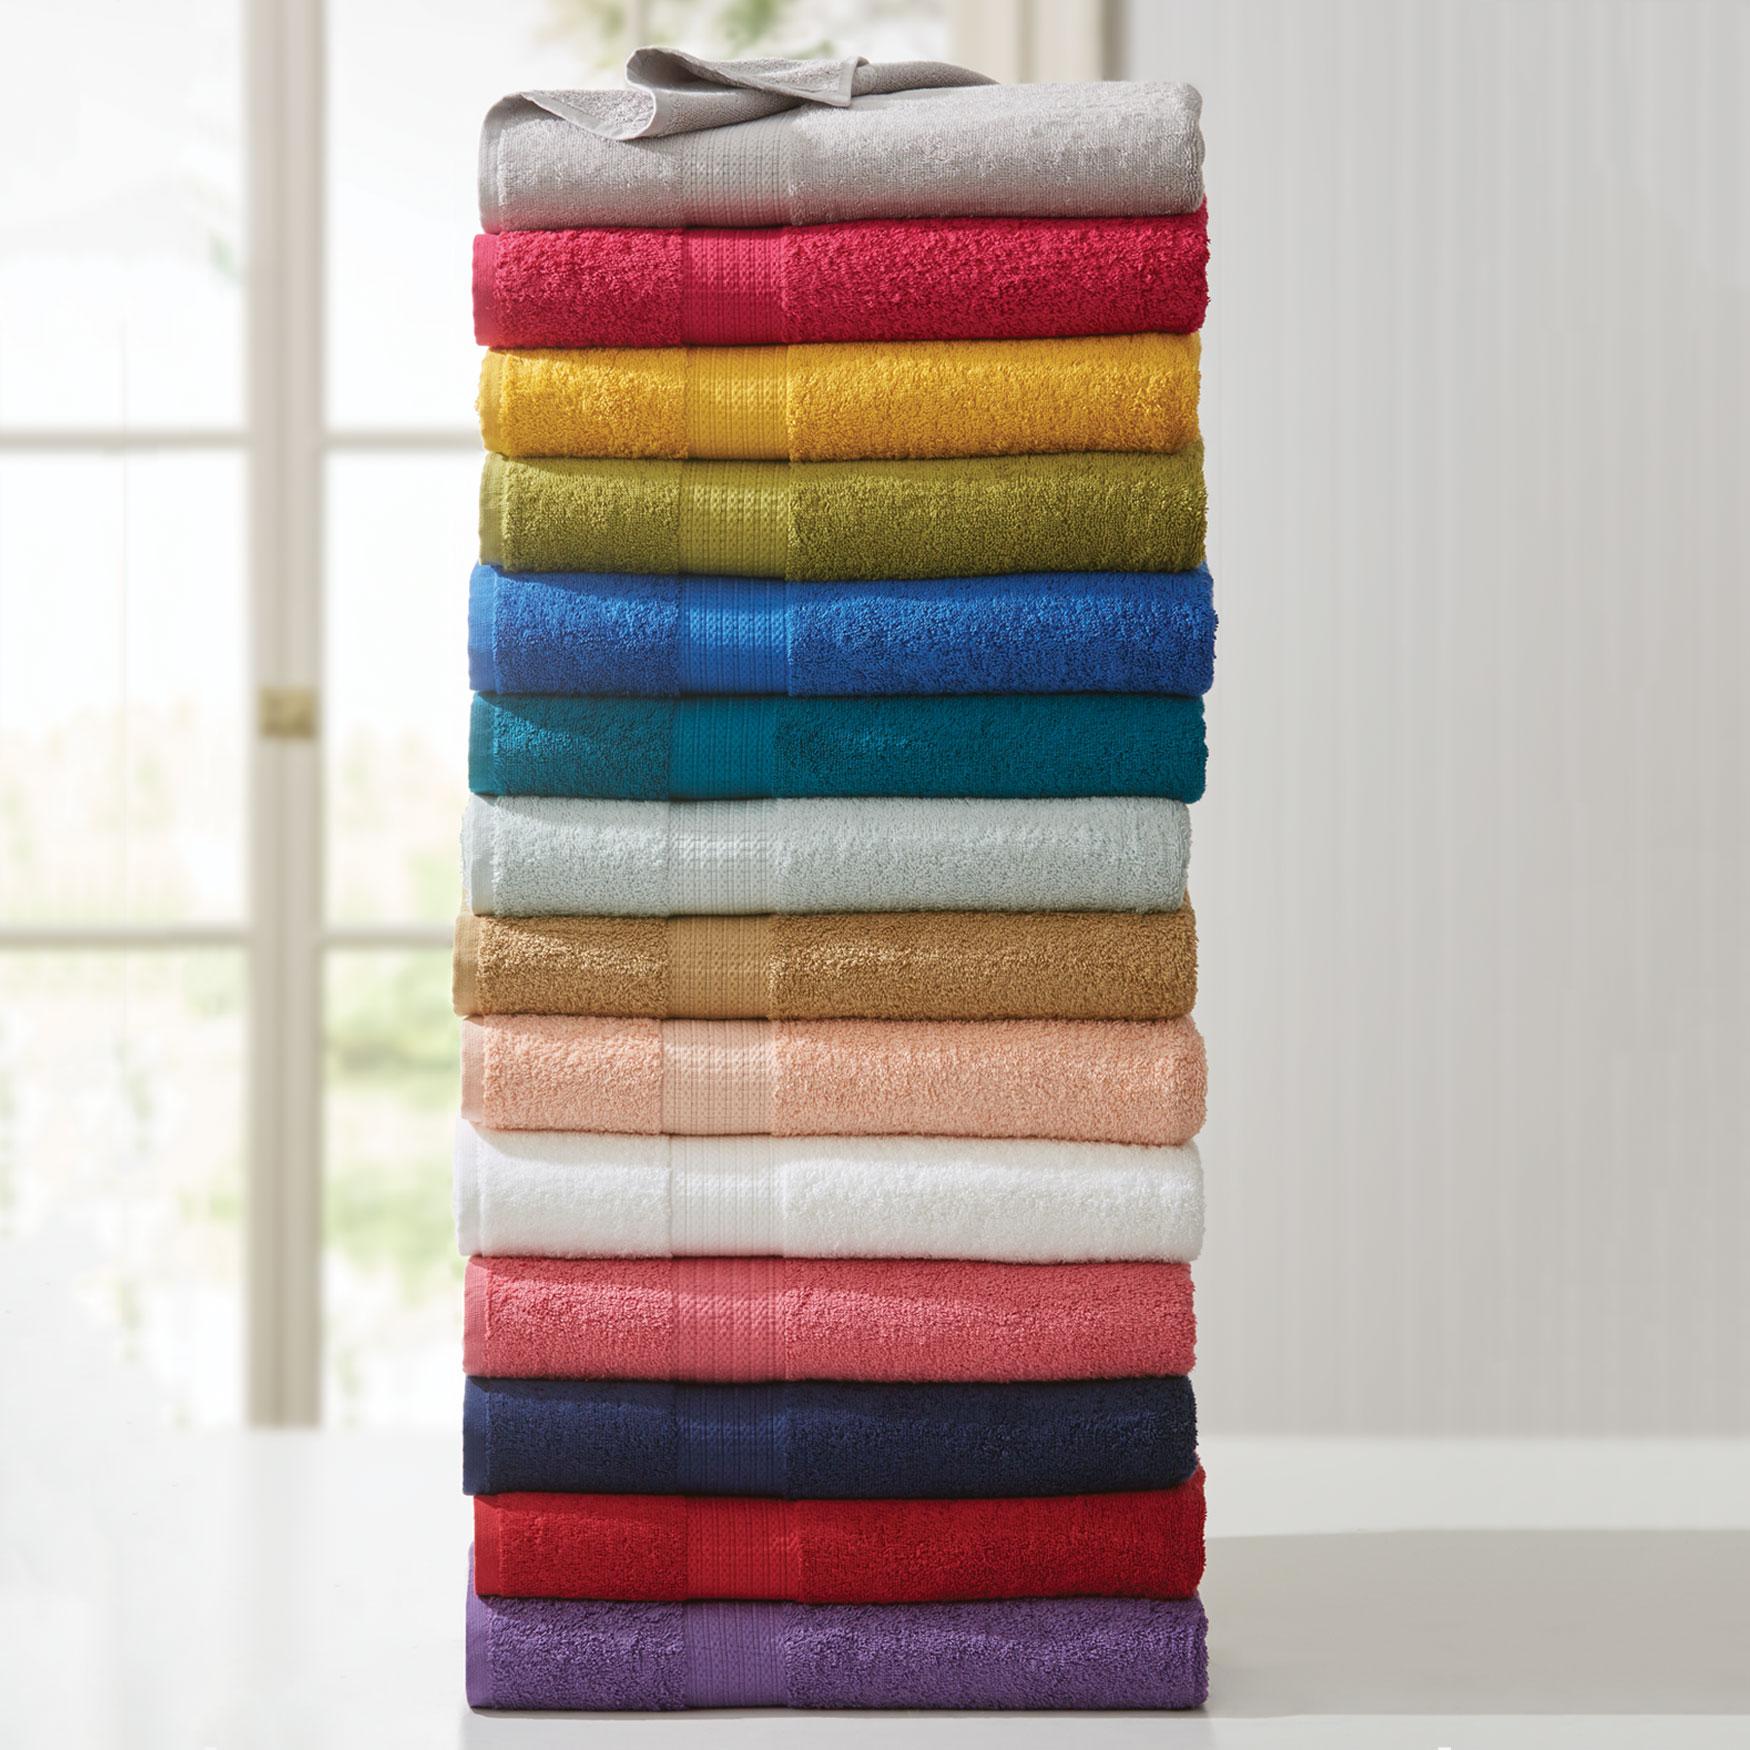 Bath Sheets Oversized: BrylaneHome® Studio Oversized Cotton Bath Sheet Towel